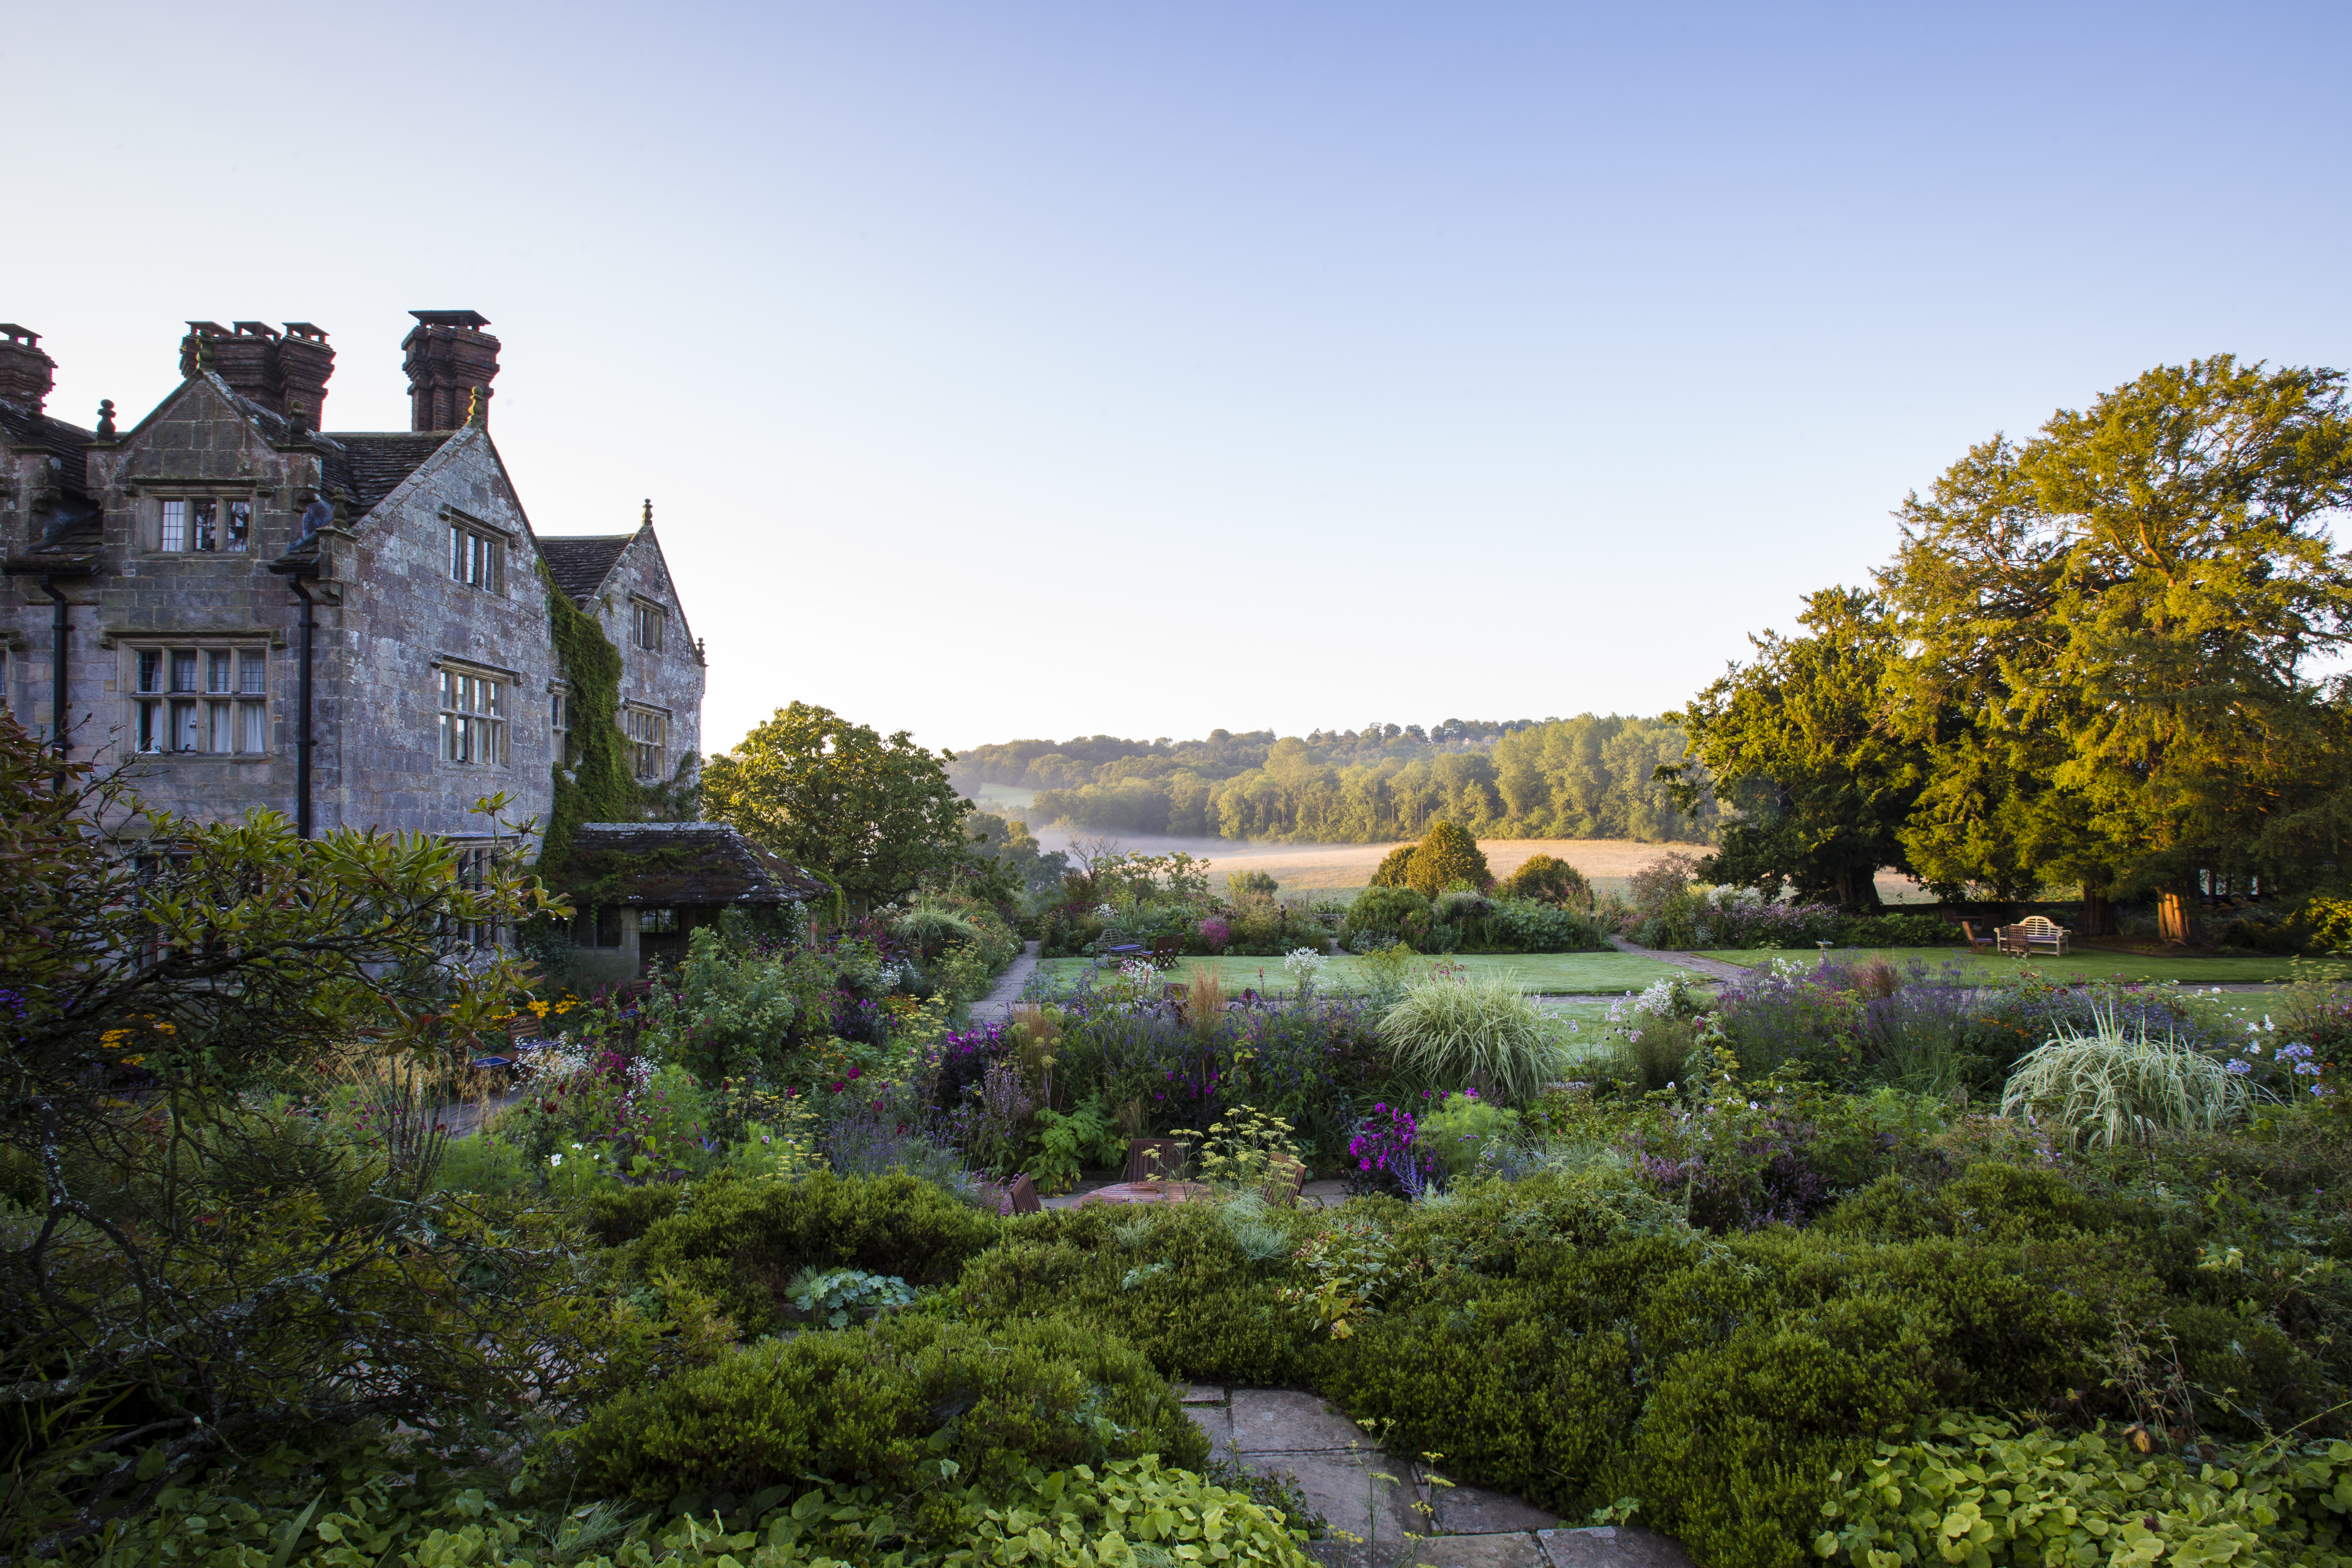 Gravetye Manor credit Claire Takacs